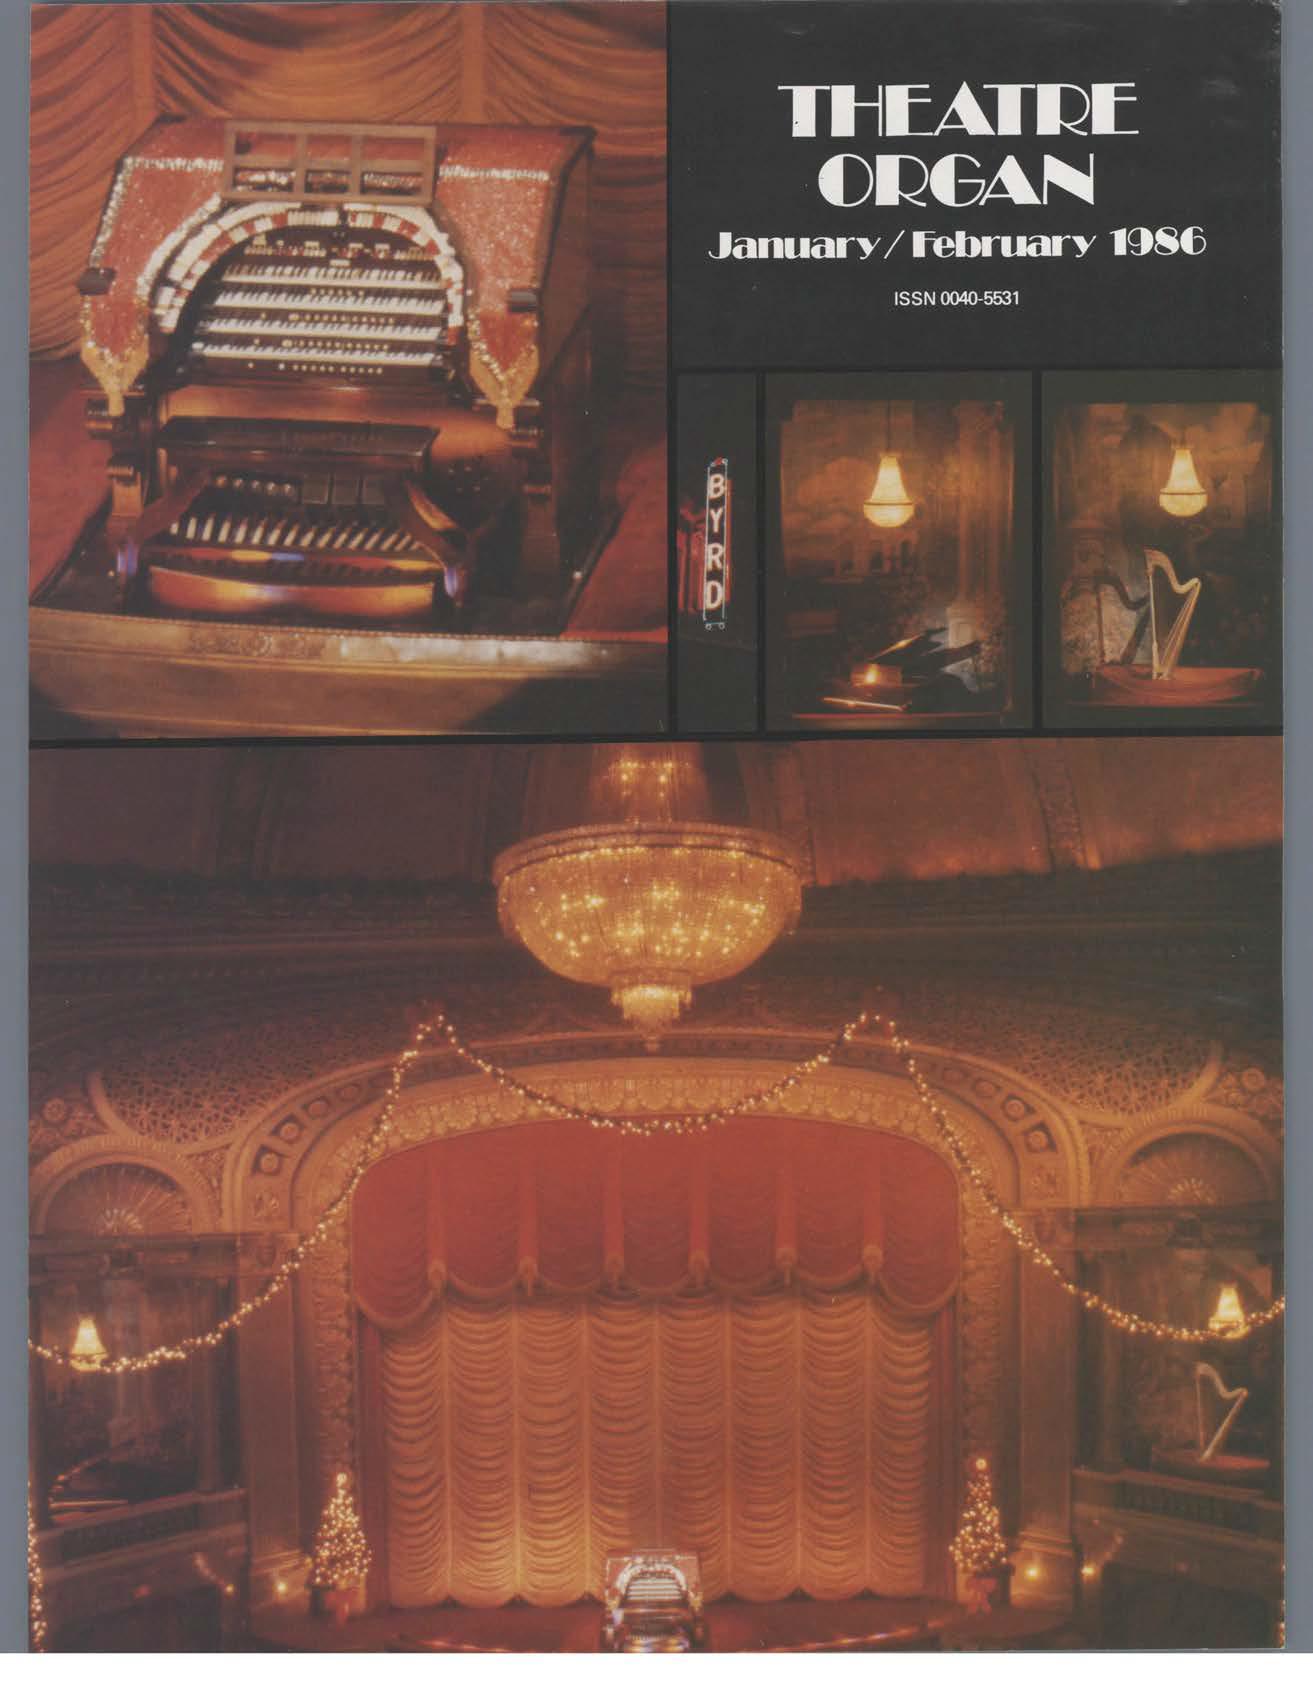 Theatre Organ, January - February 1986, Volume 28, Number 1